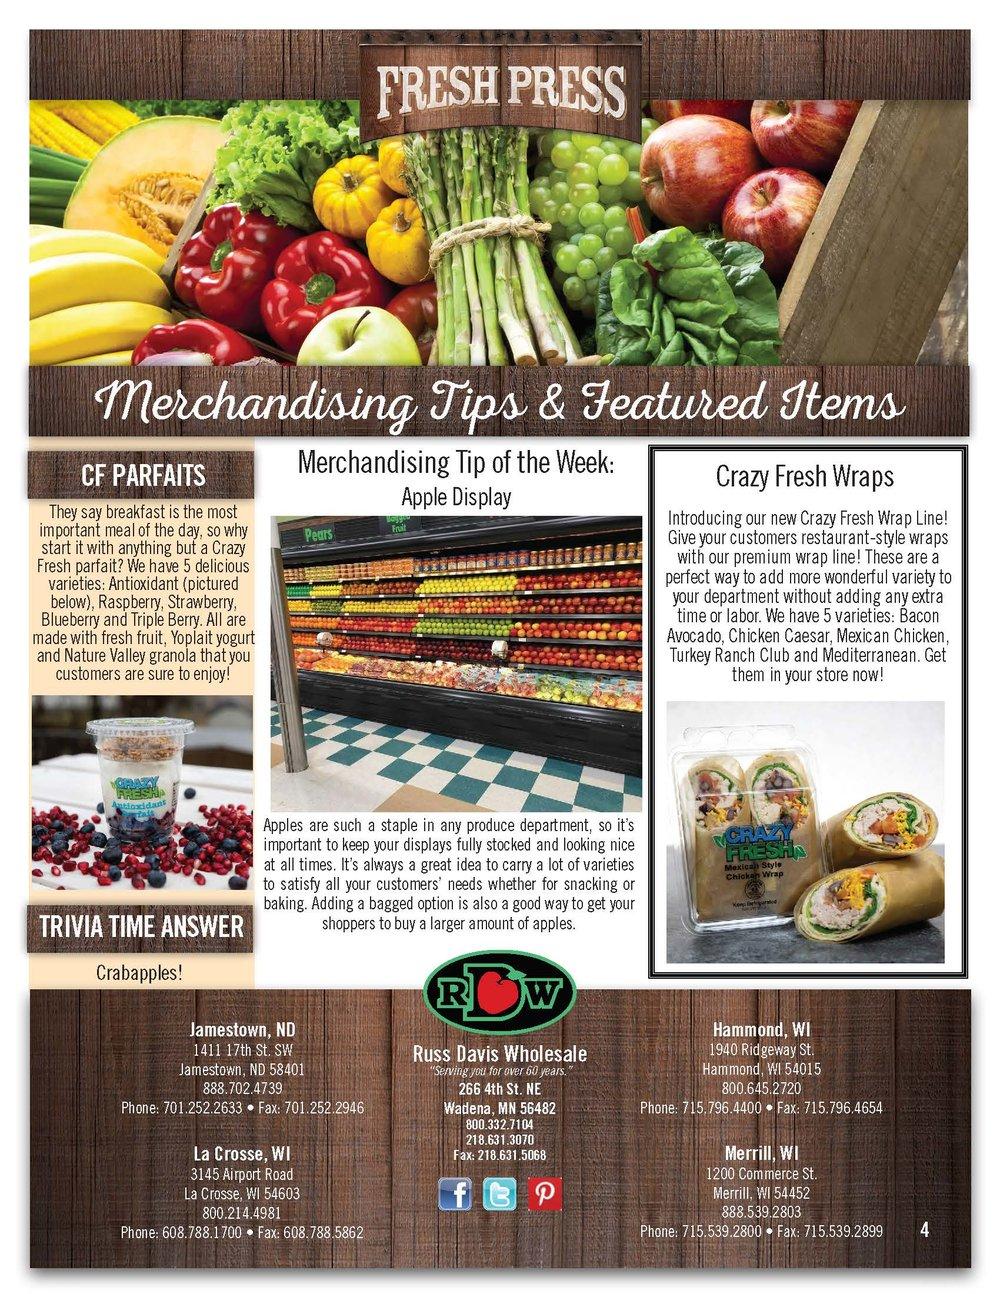 RDW_Fresh_Press_Jan9_2019_Page_4.jpg